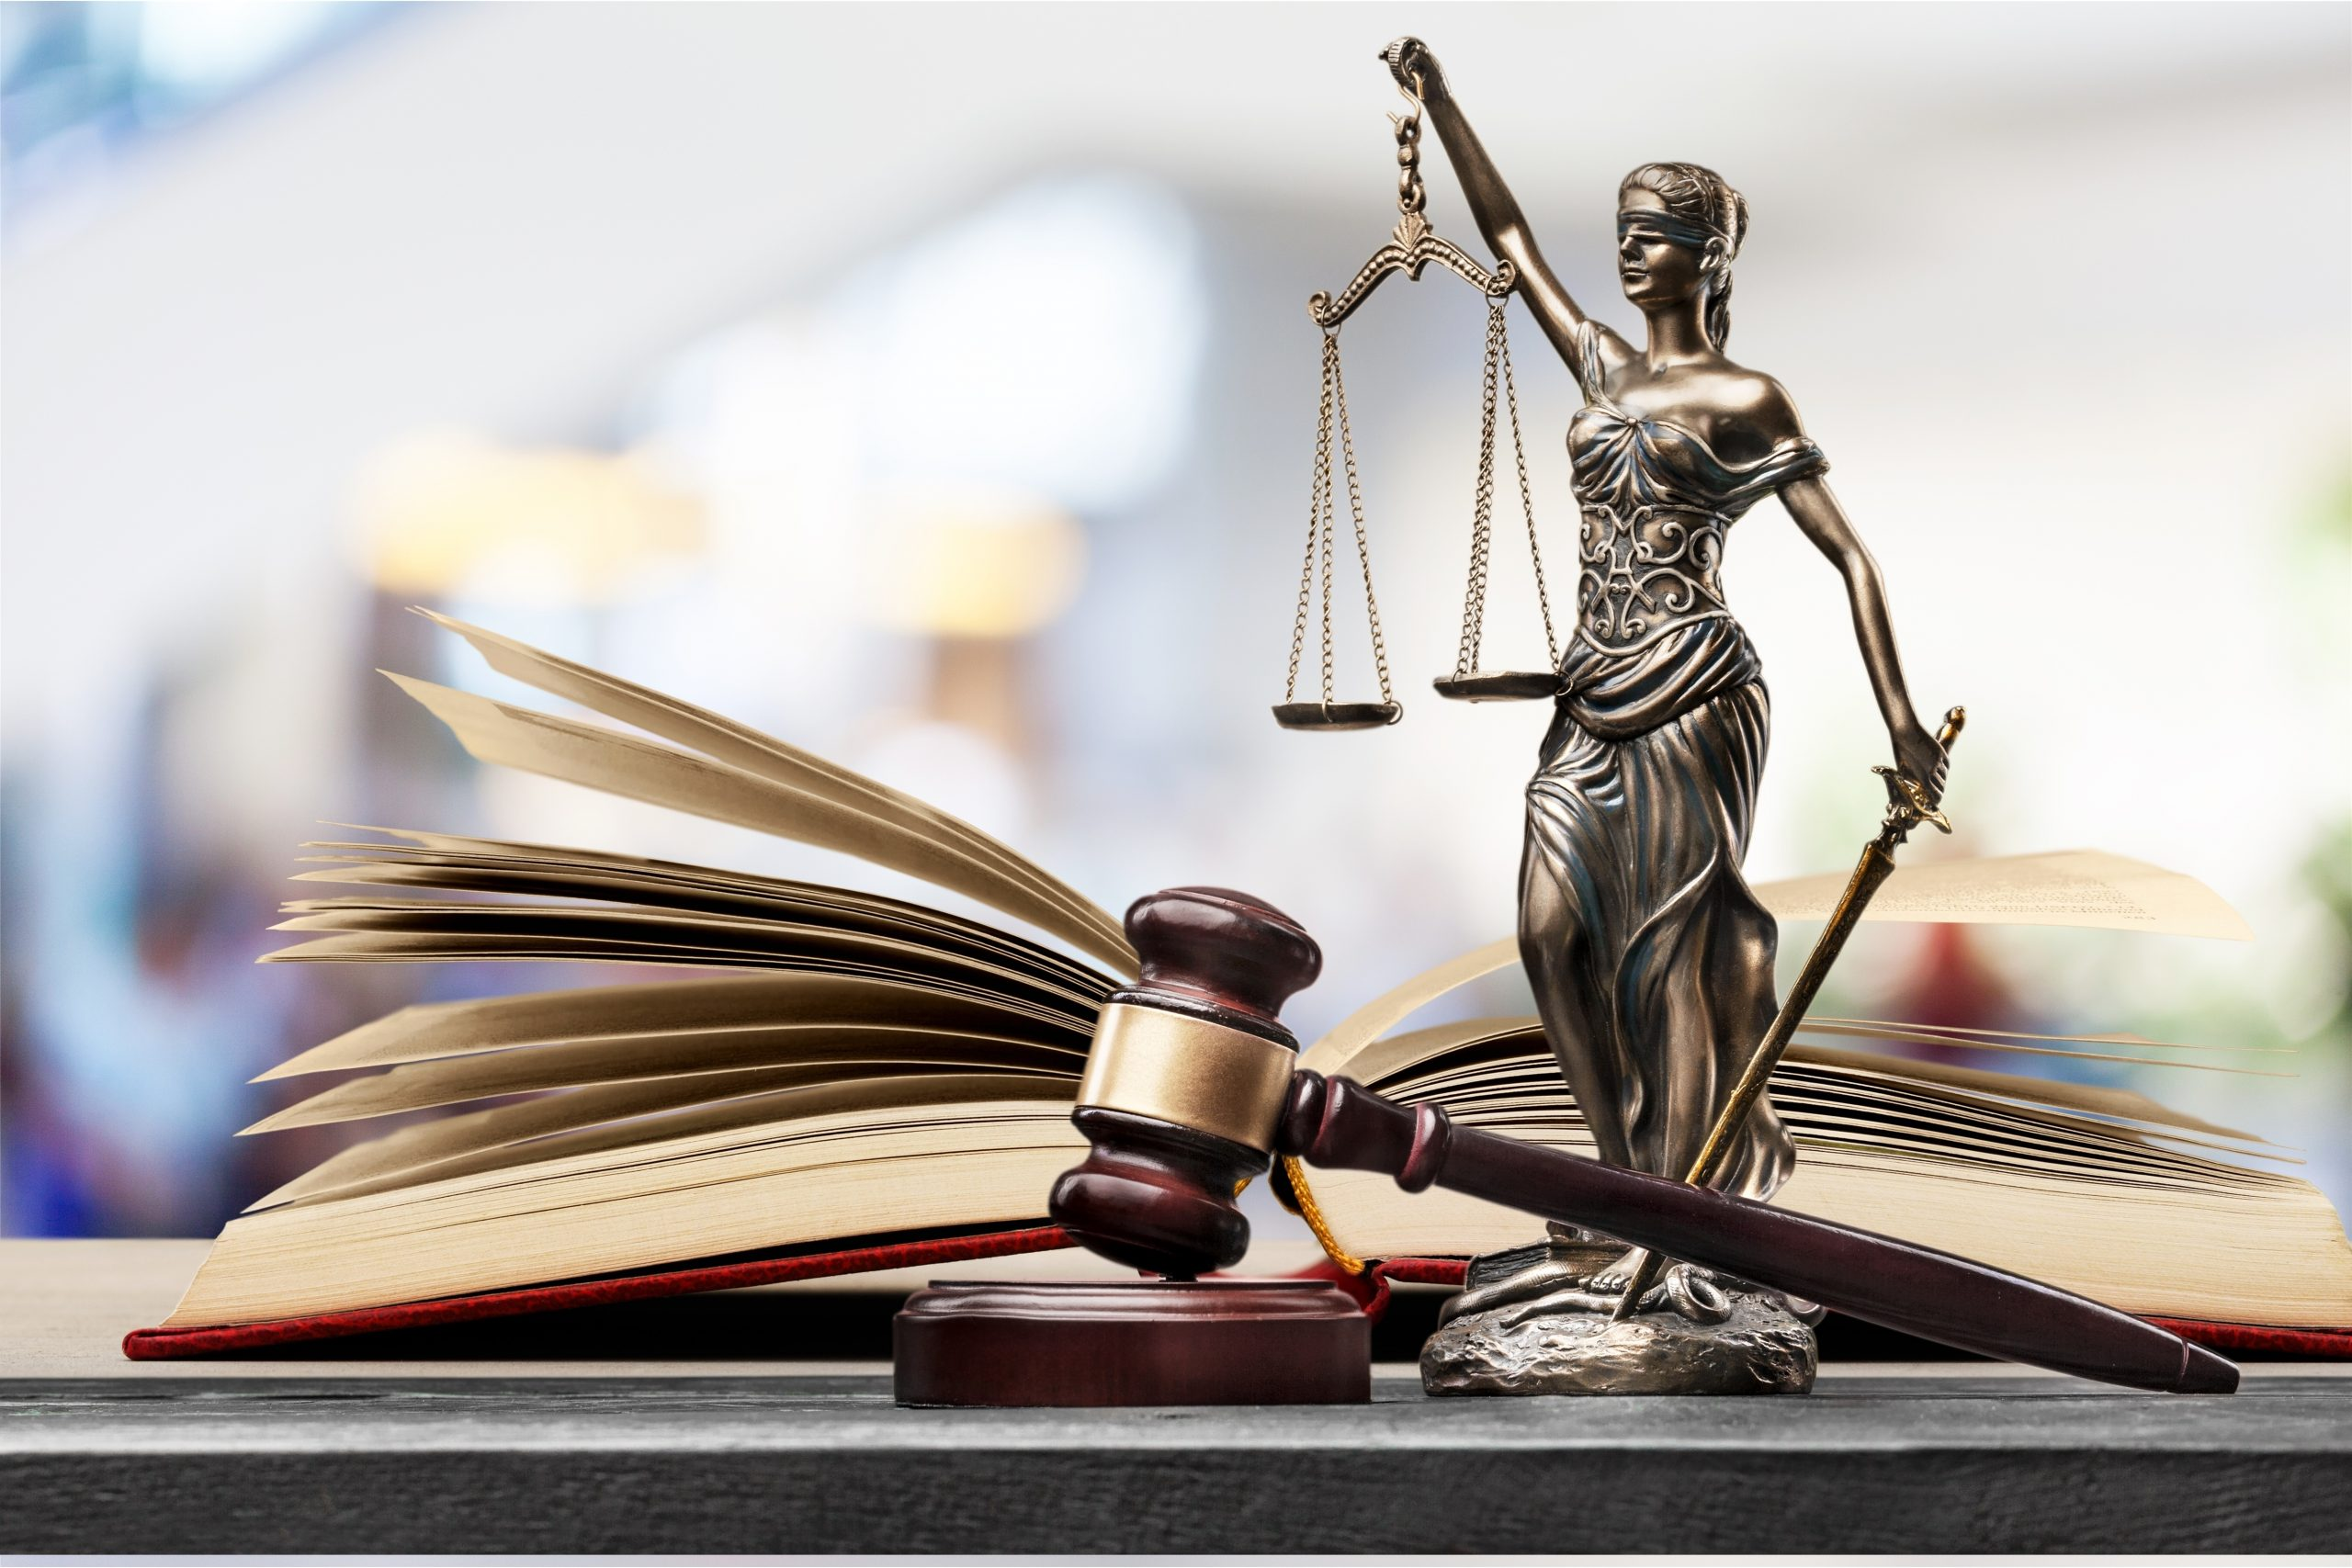 Justizia assistierter Suizid